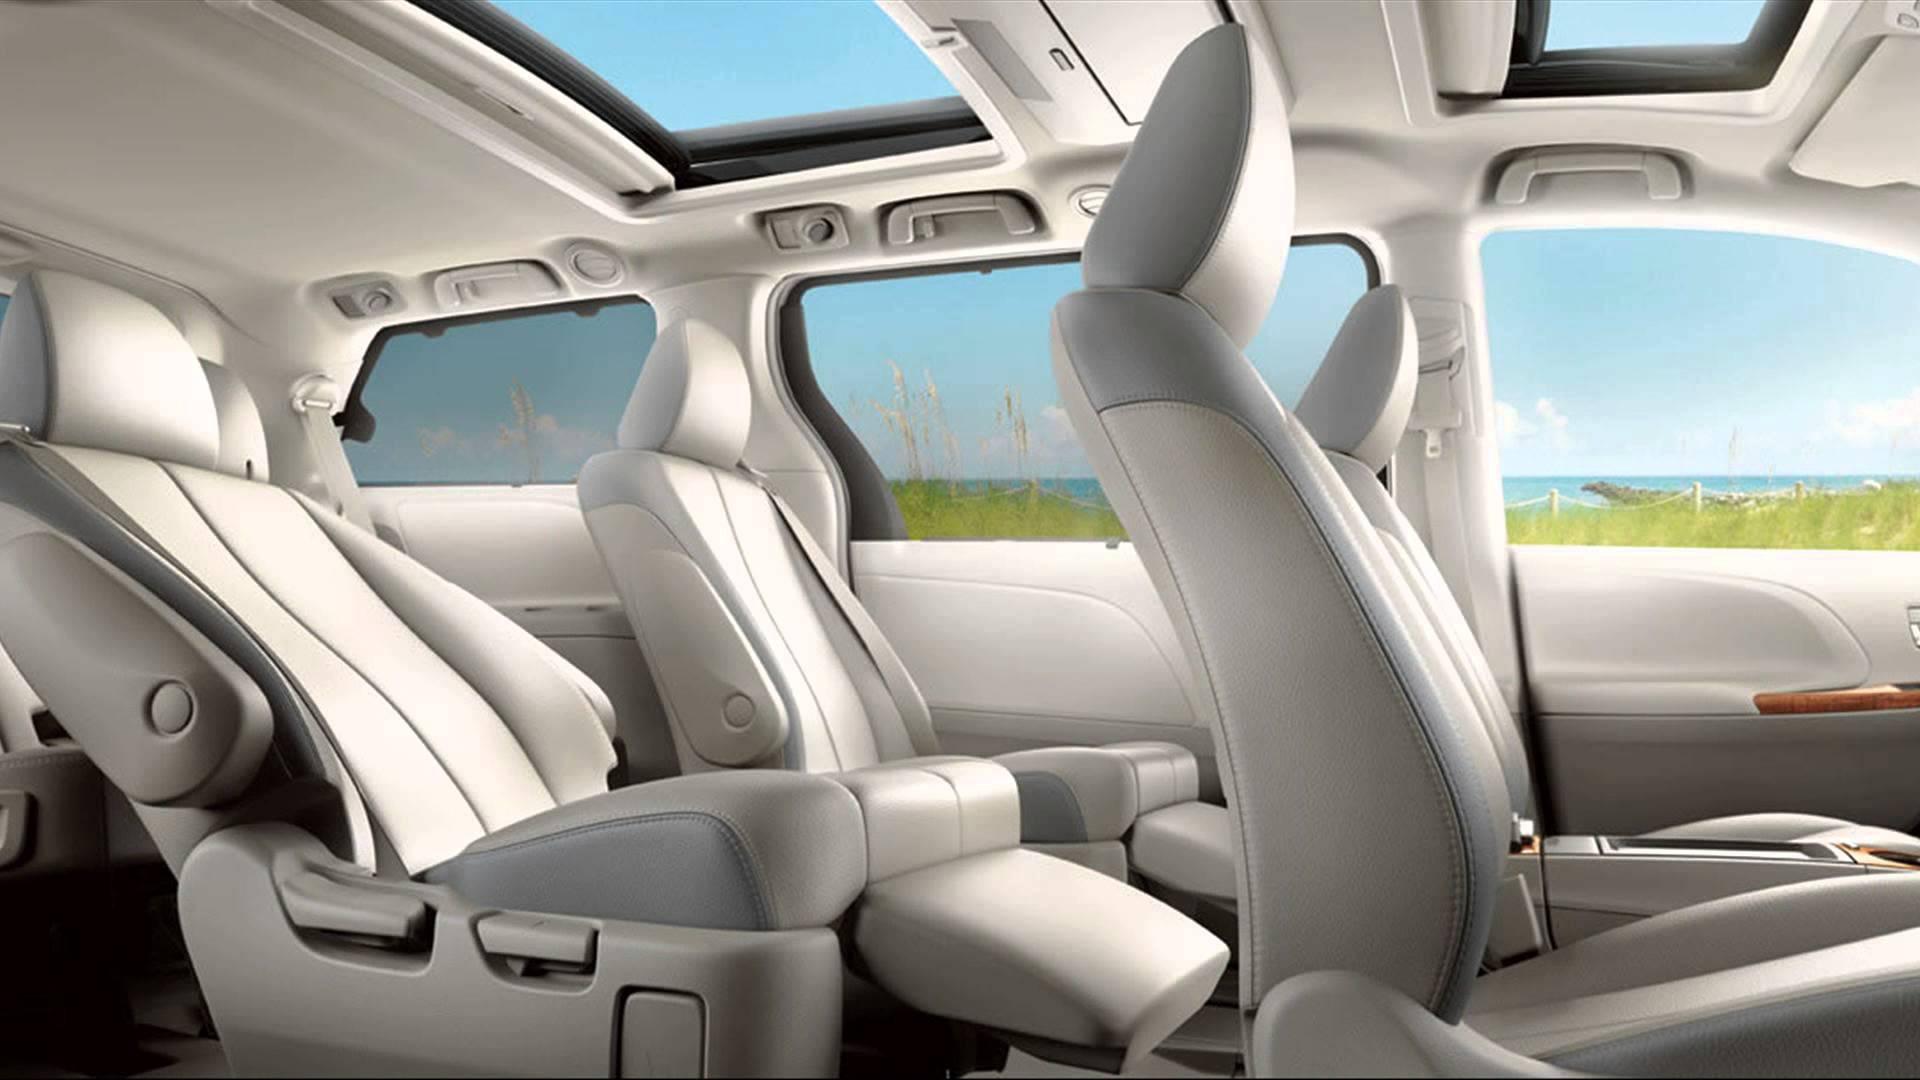 minivan-rental-interior-two